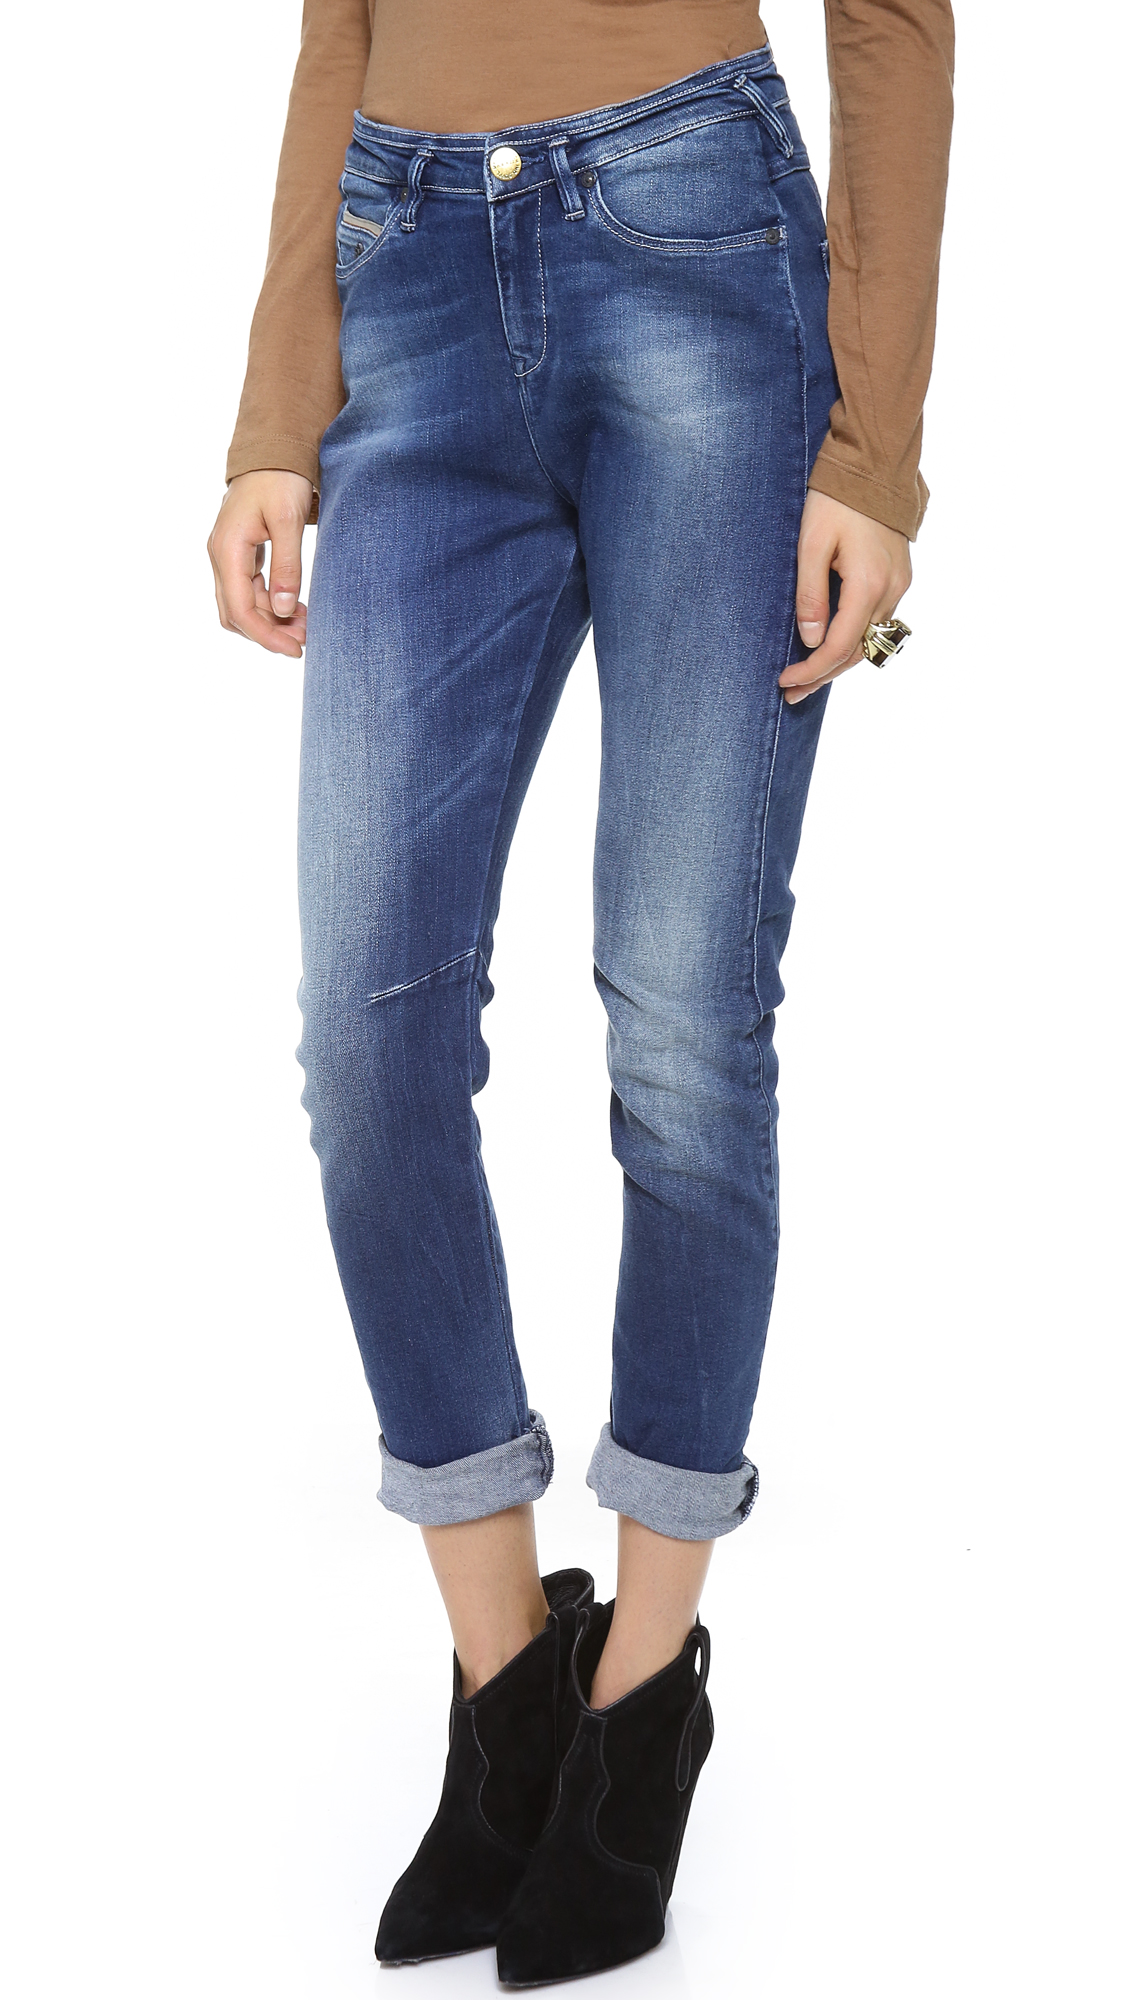 maison scotch mademoiselle slim jeans cosmopolitan blue stretch in blue cosmopolitan blue. Black Bedroom Furniture Sets. Home Design Ideas